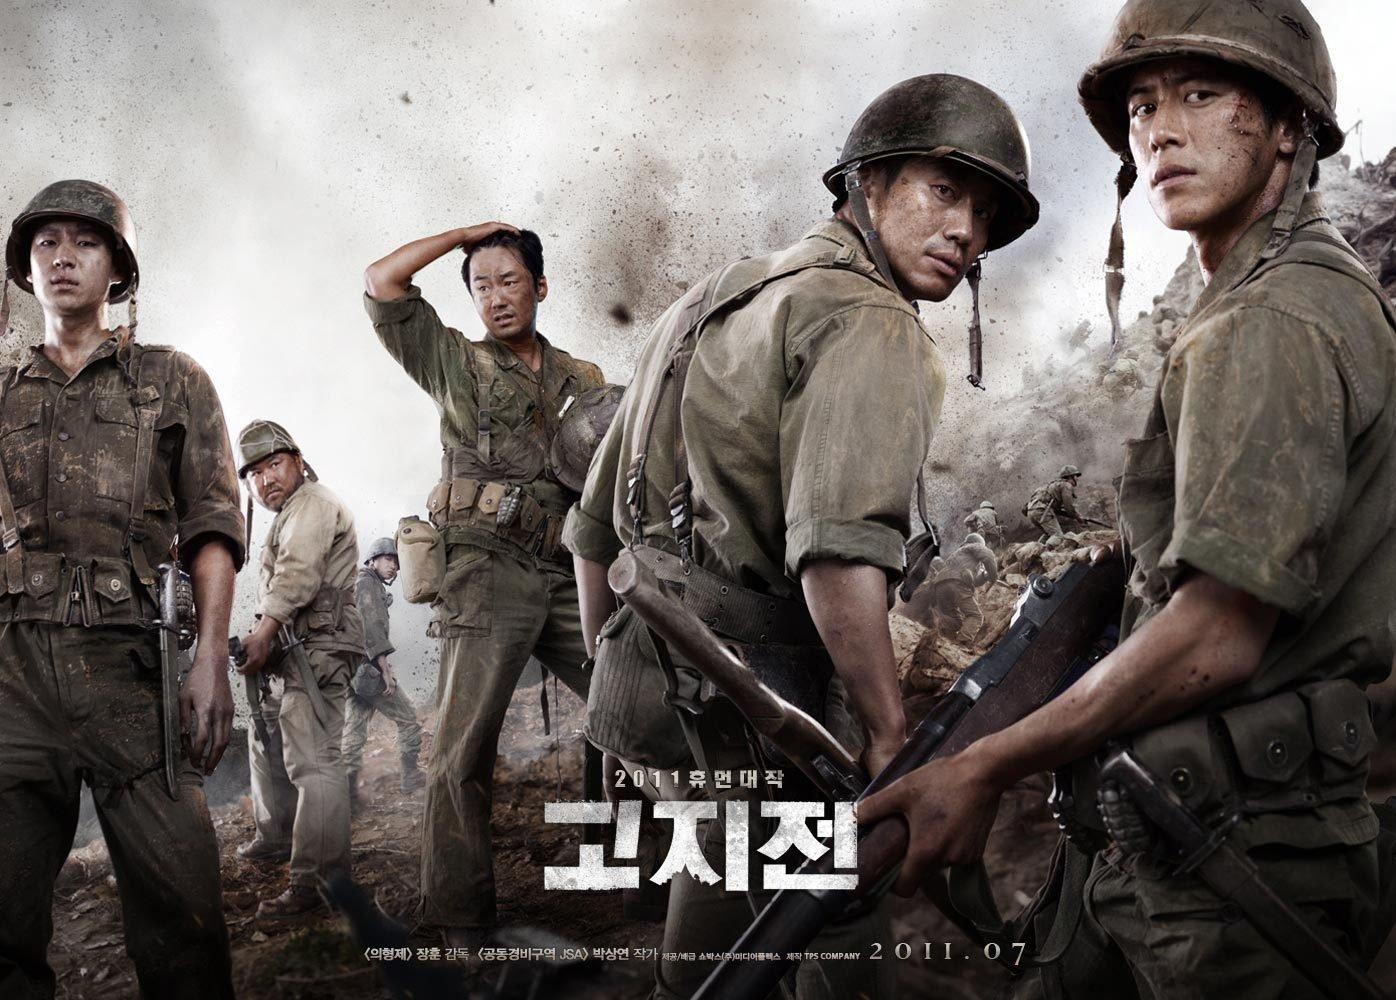 front line poster.jpg